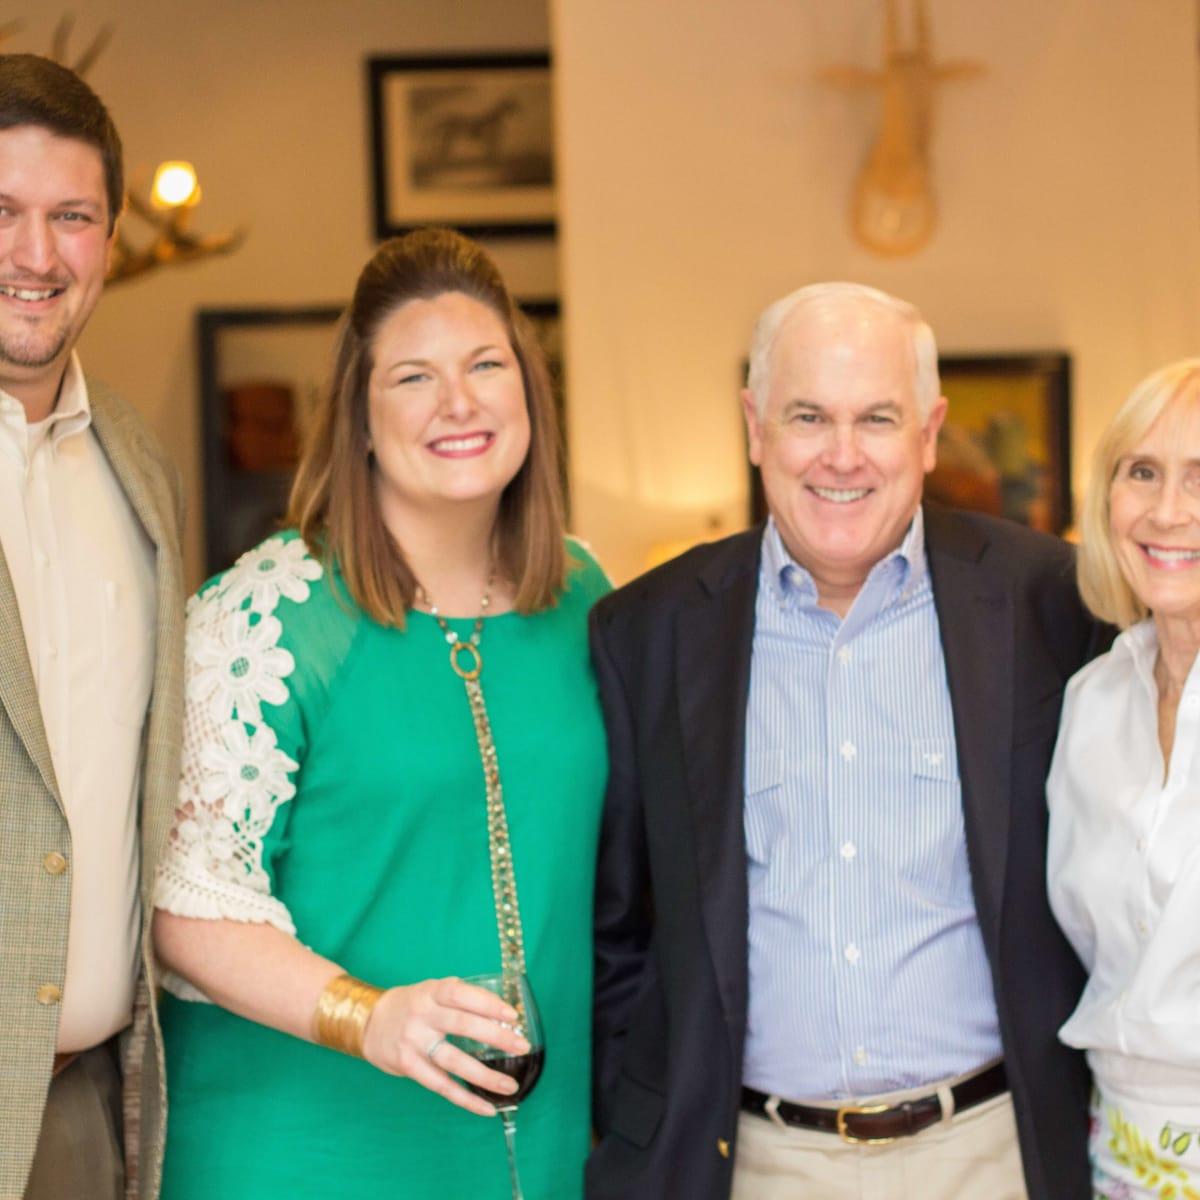 King Ranch Saddle Shop in Houston, August 2016, Lance Hancock, Lindsey Hancock, Bill Gardiner, Nancy Gardiner